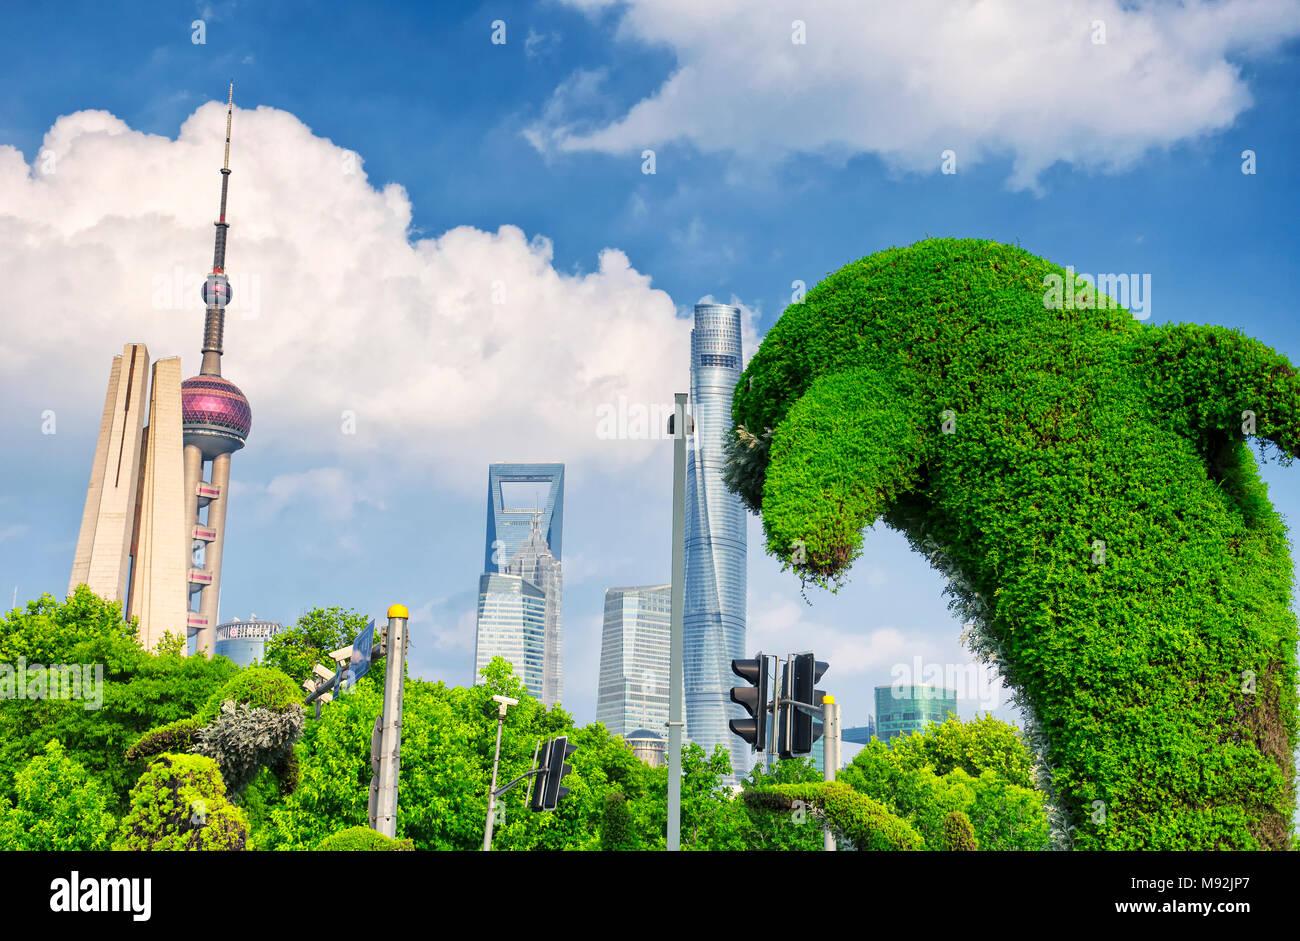 A large dolphin shaped bush near the waibaidu (garden) bridge on the Puxi side of Shanghai China. - Stock Image